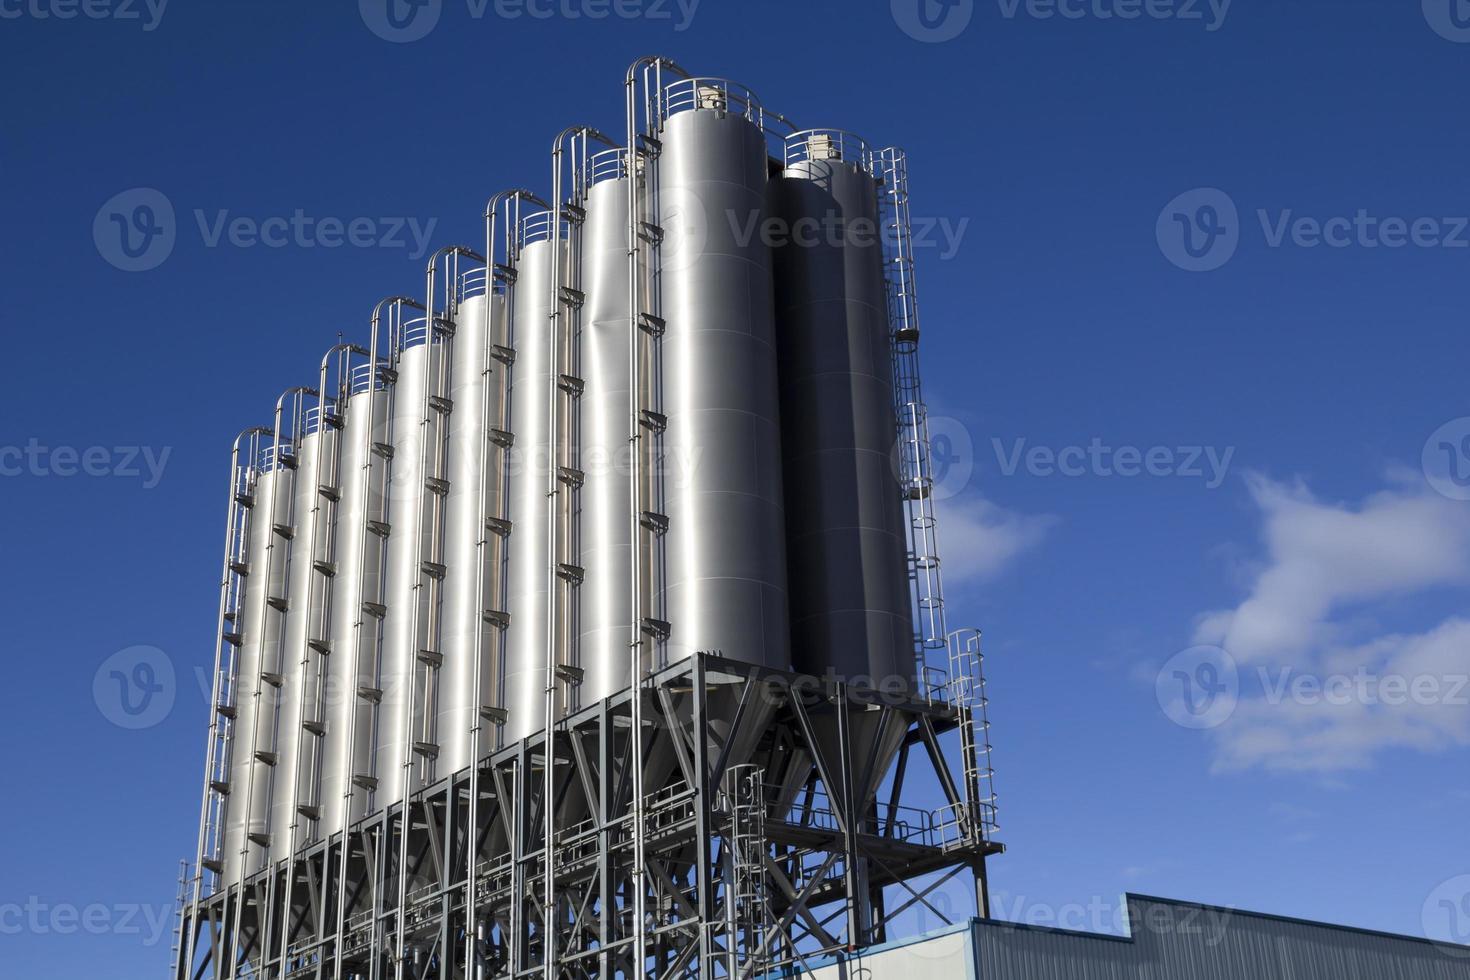 silos industriali foto